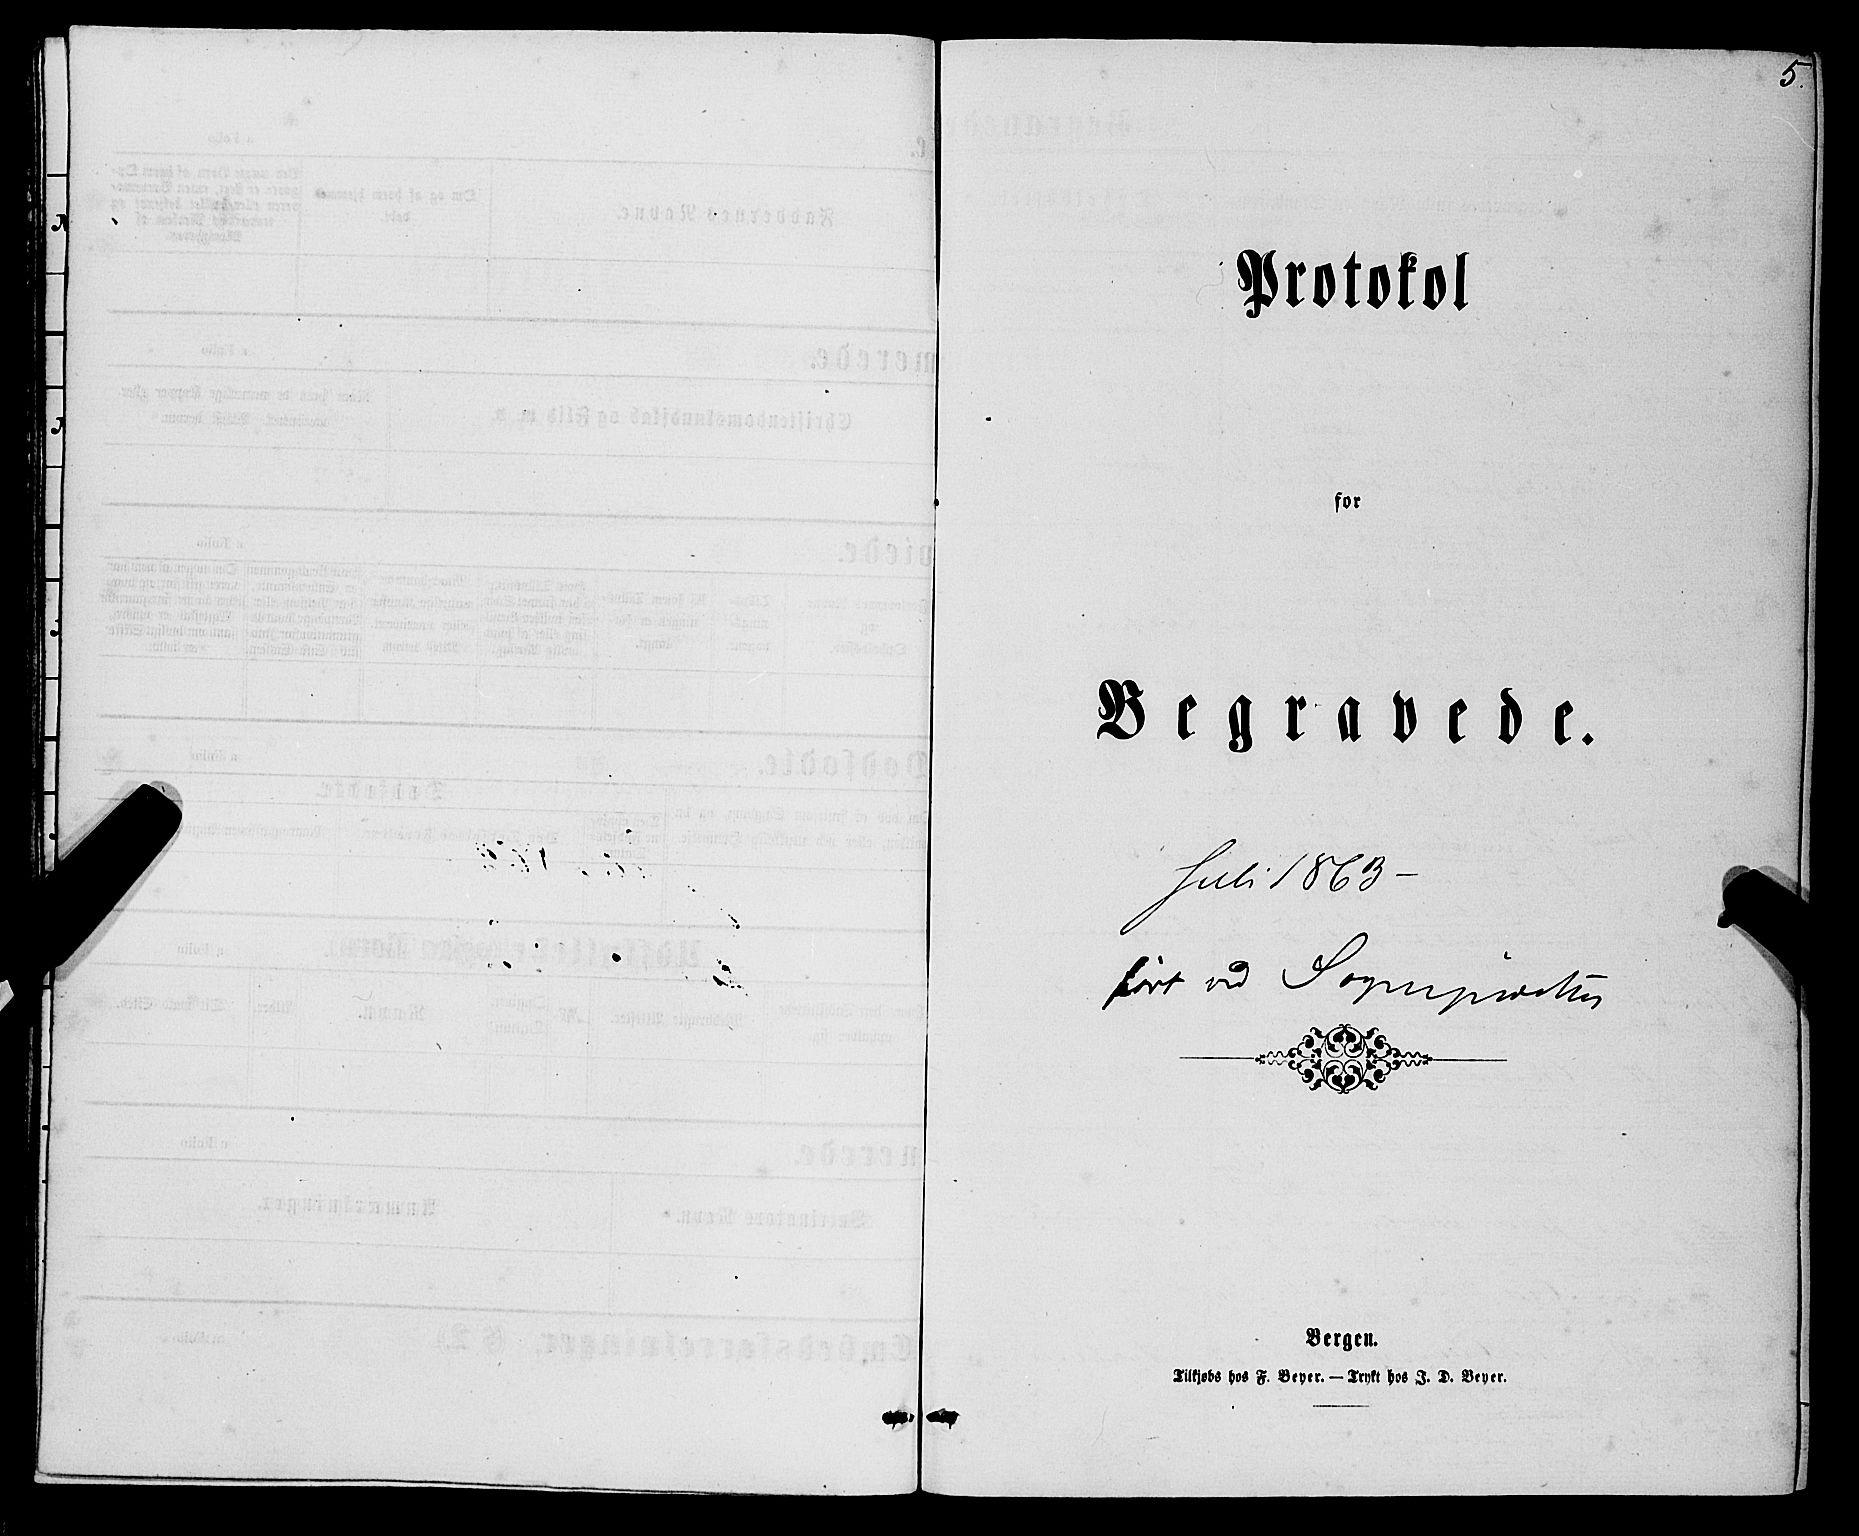 SAB, Domkirken sokneprestembete, H/Haa/L0042: Ministerialbok nr. E 3, 1863-1876, s. 5